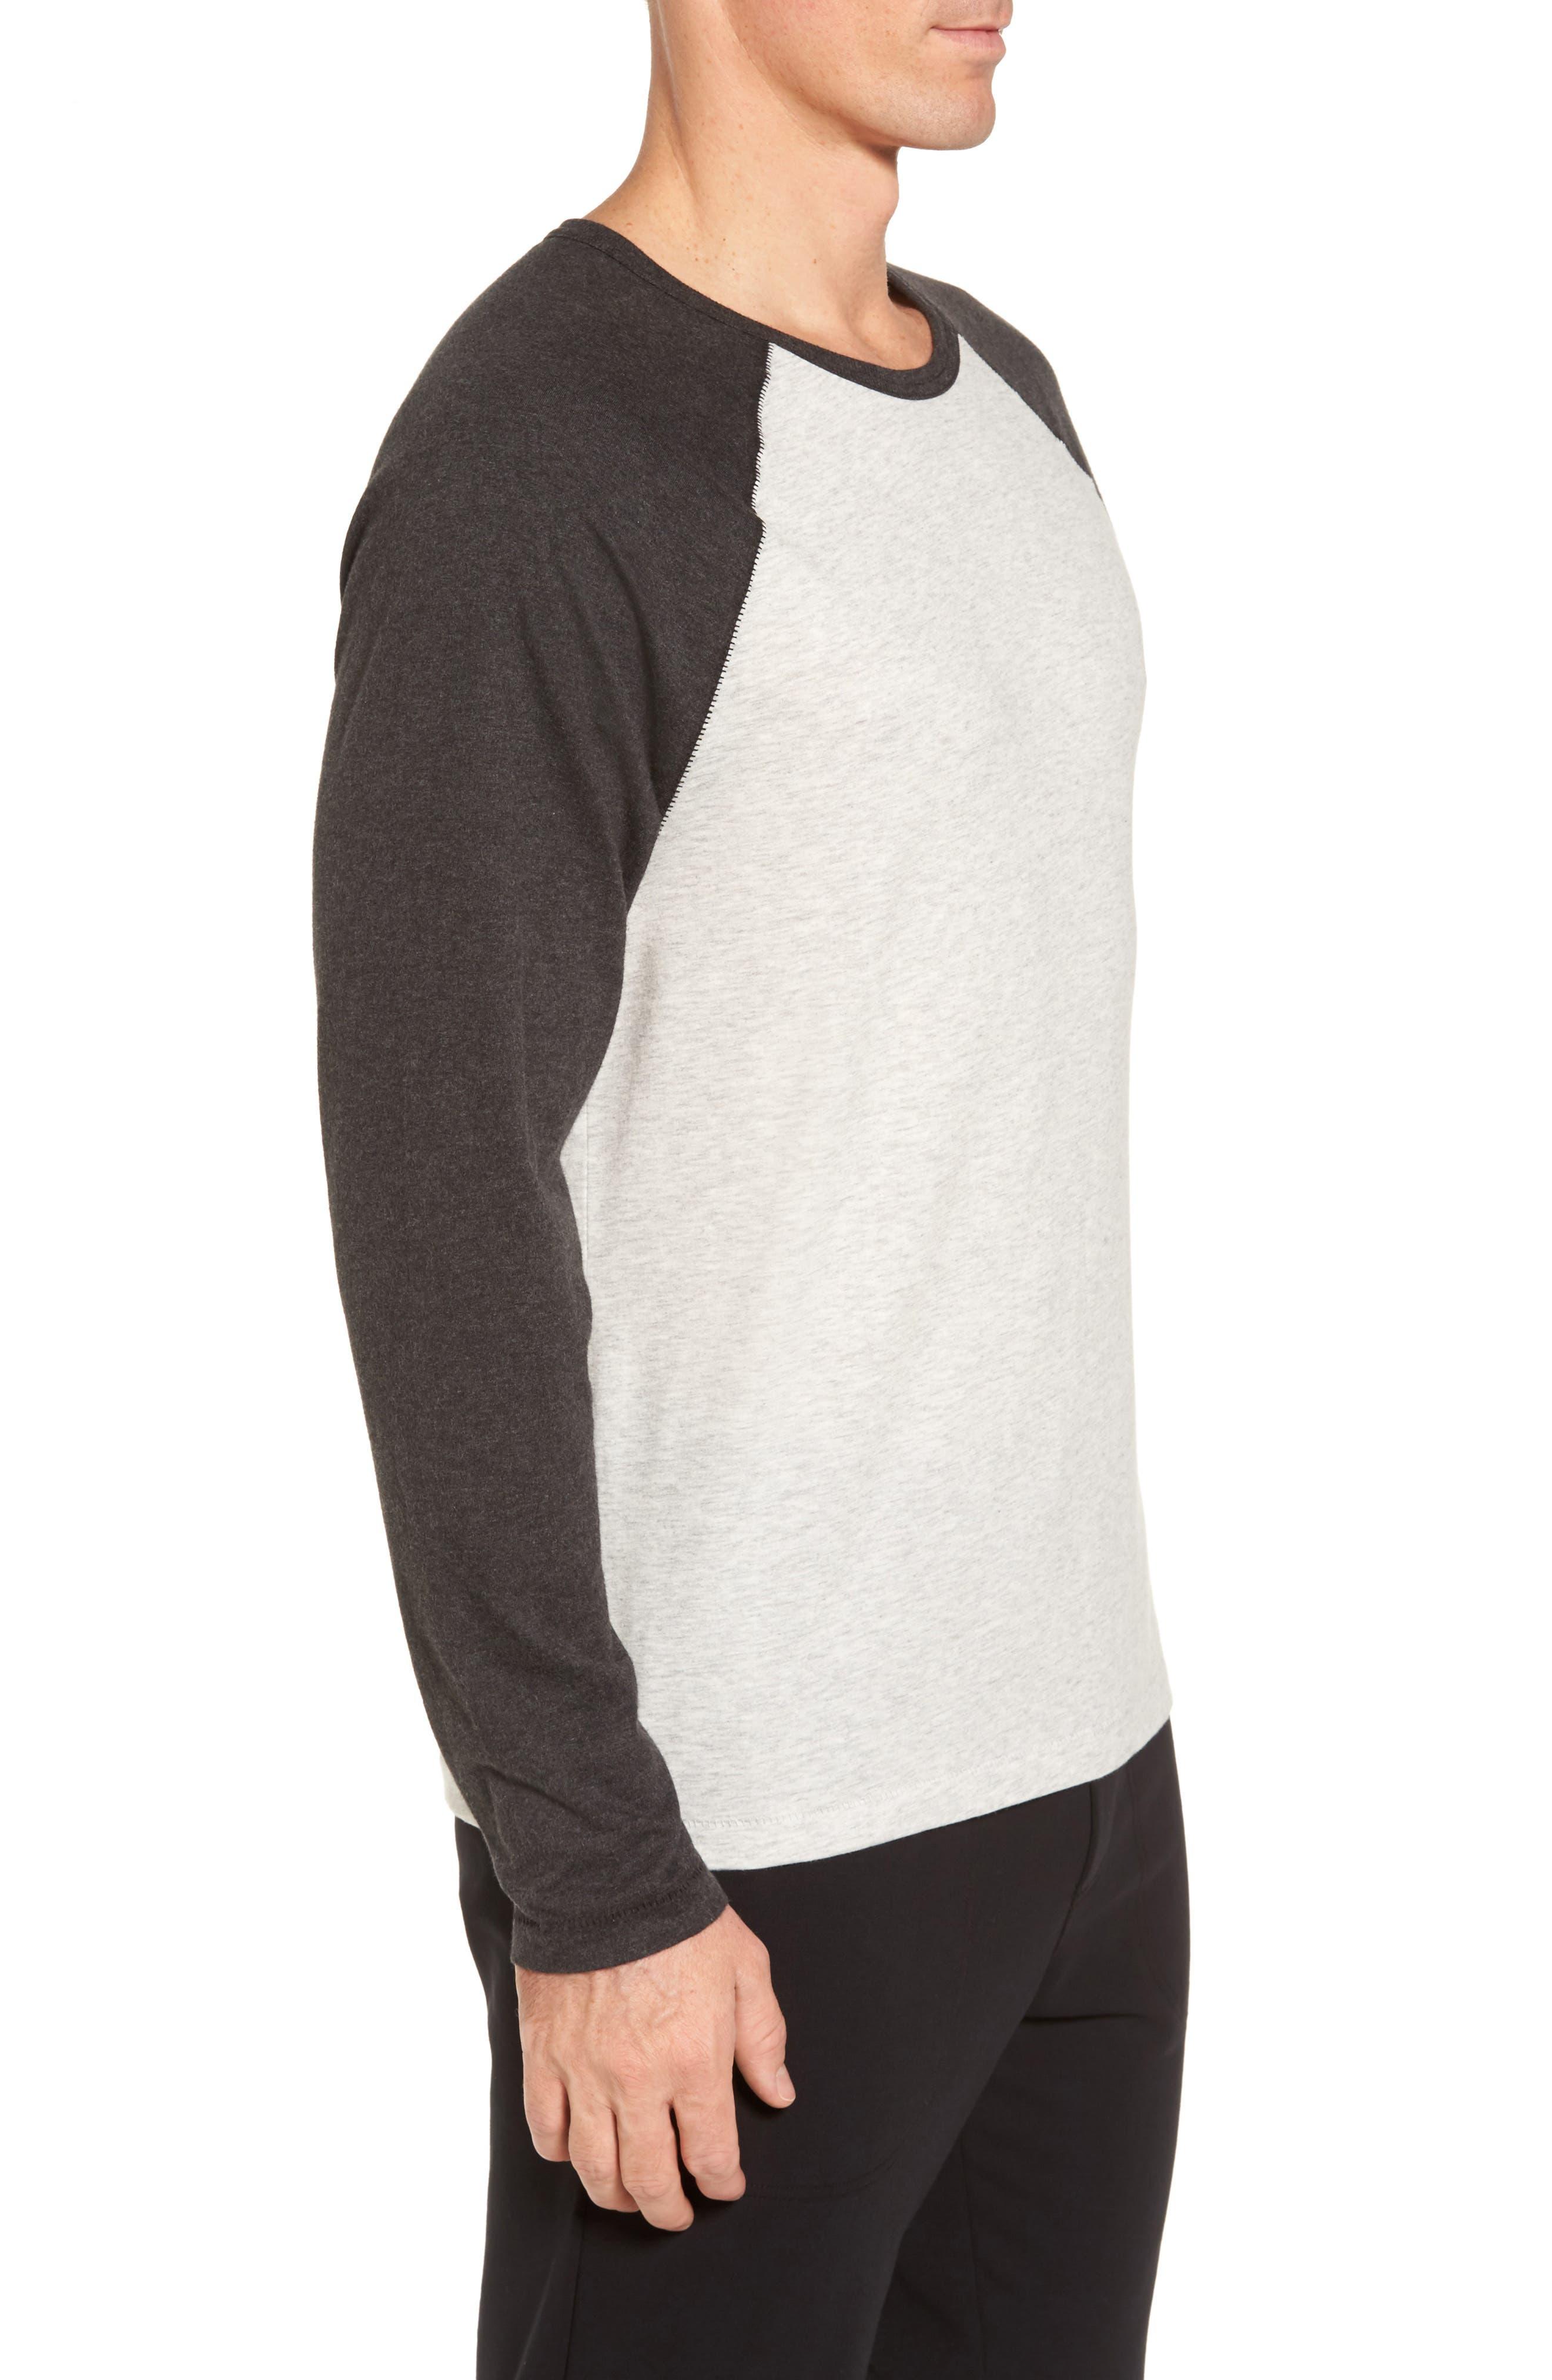 Stefan Raglan T-Shirt,                             Alternate thumbnail 3, color,                             024